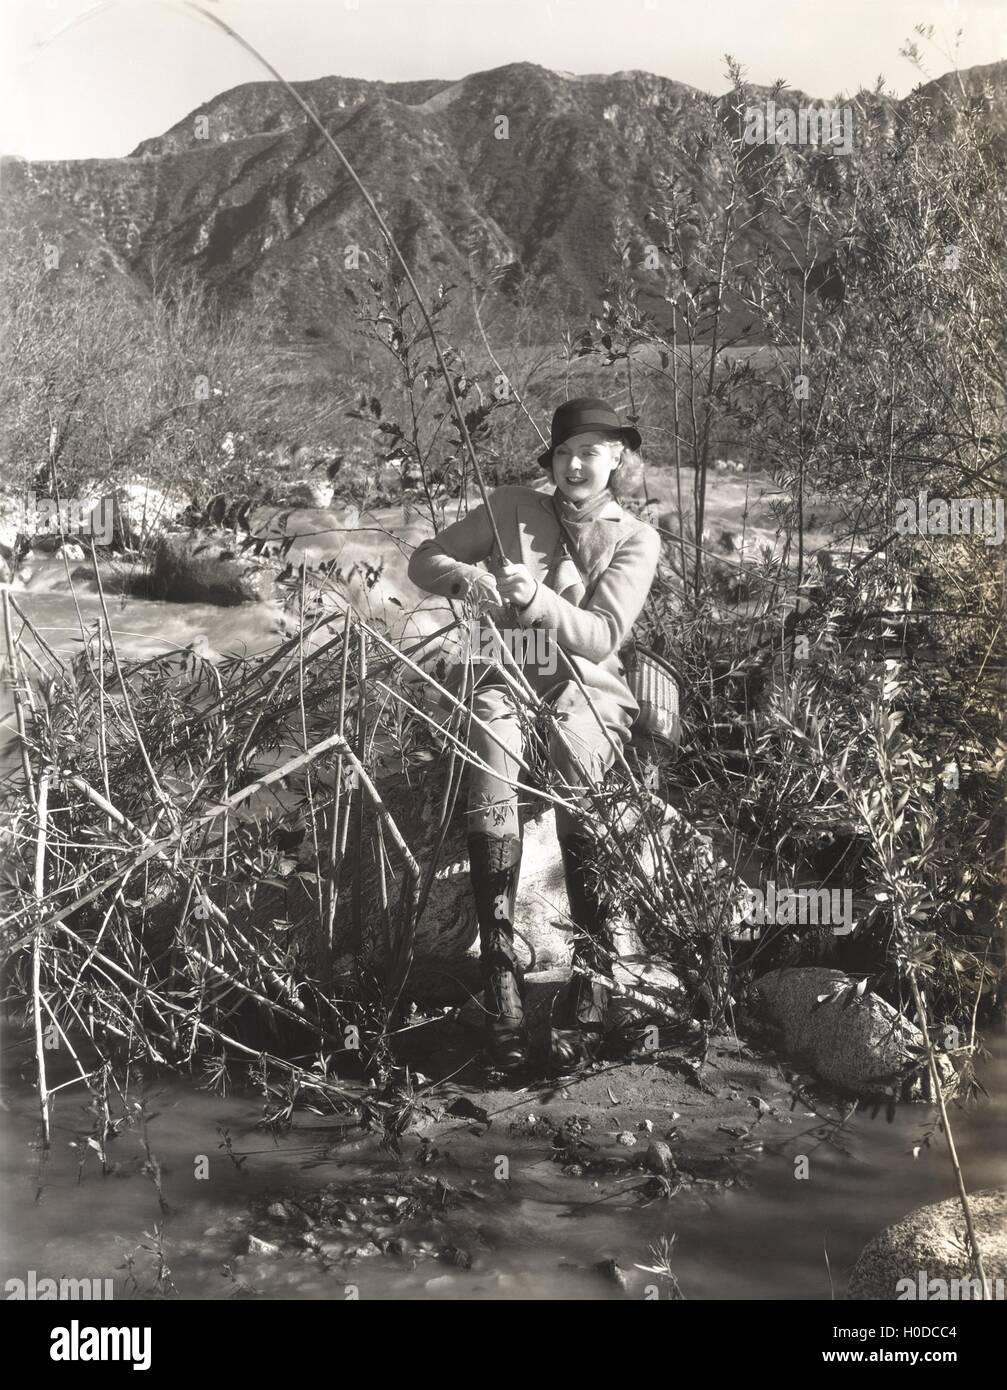 Woman fishing on a river bank - Stock Image